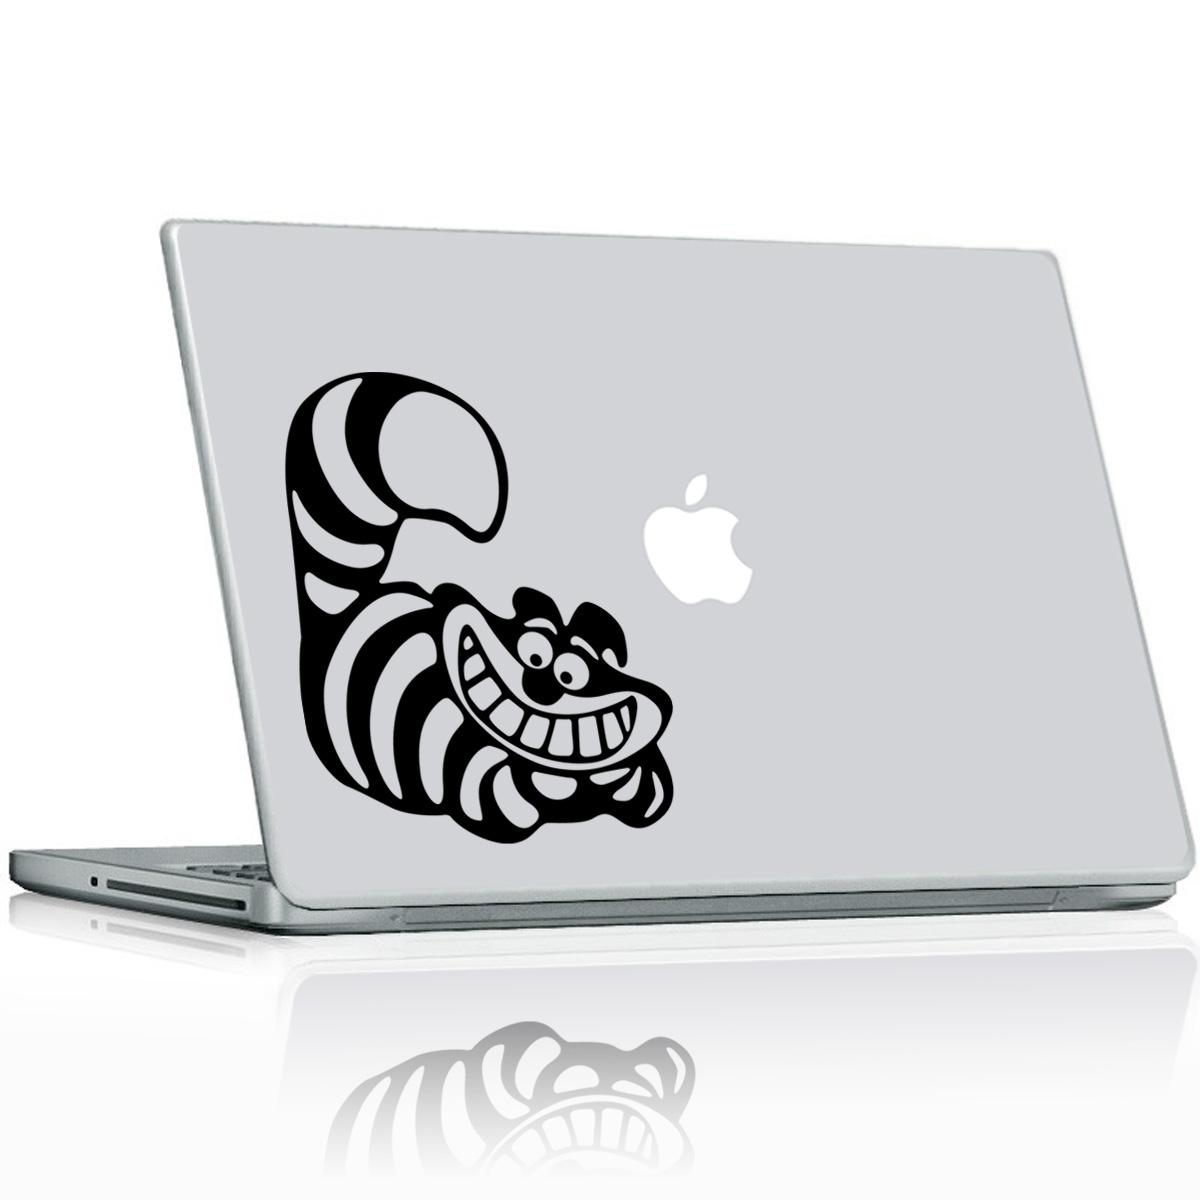 stickers ordinateurs portables sticker cheshire cat. Black Bedroom Furniture Sets. Home Design Ideas